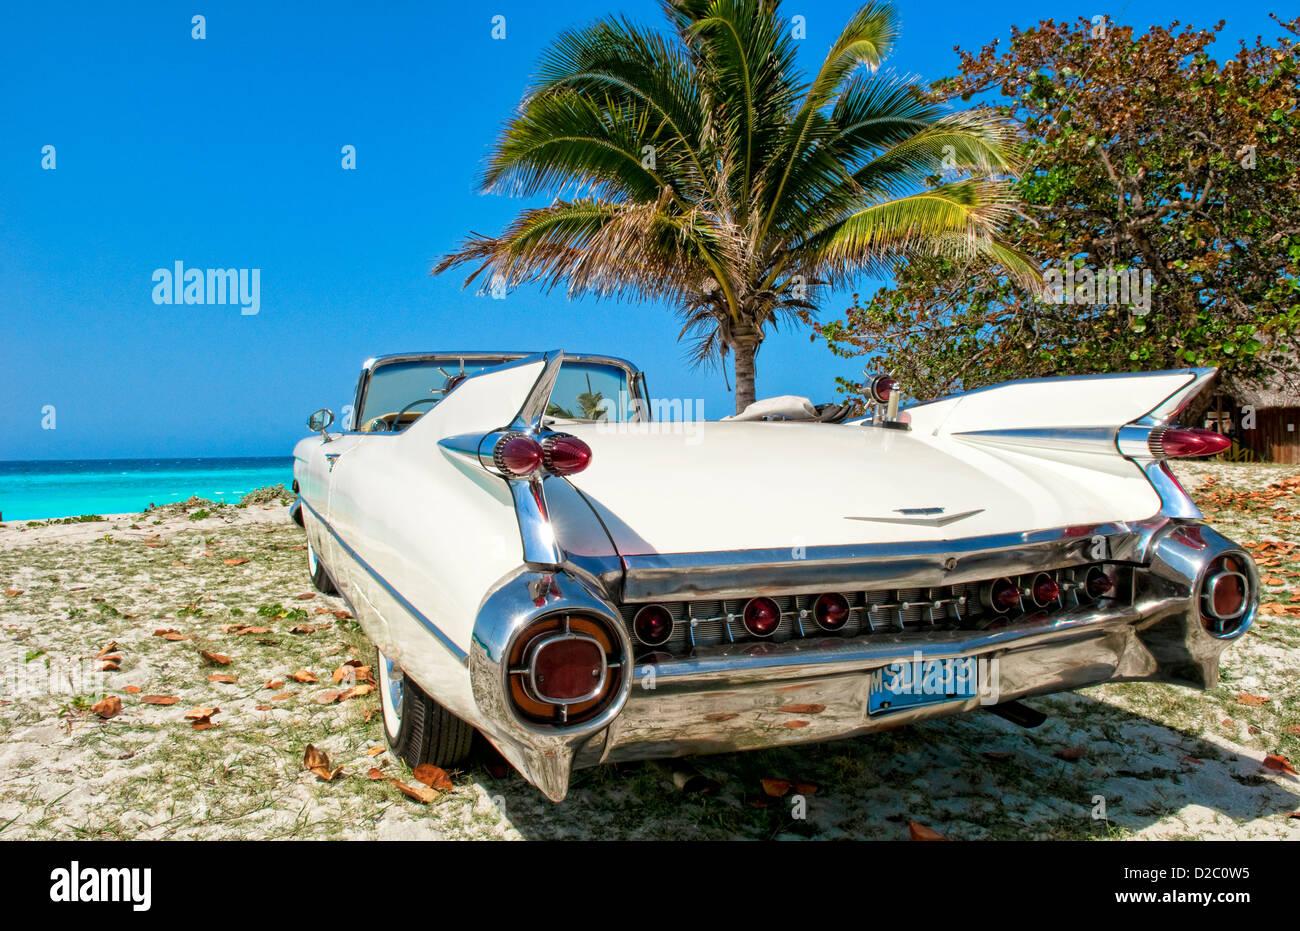 Classic 1959 White Cadillac In Veradara, Cuba - Stock Image